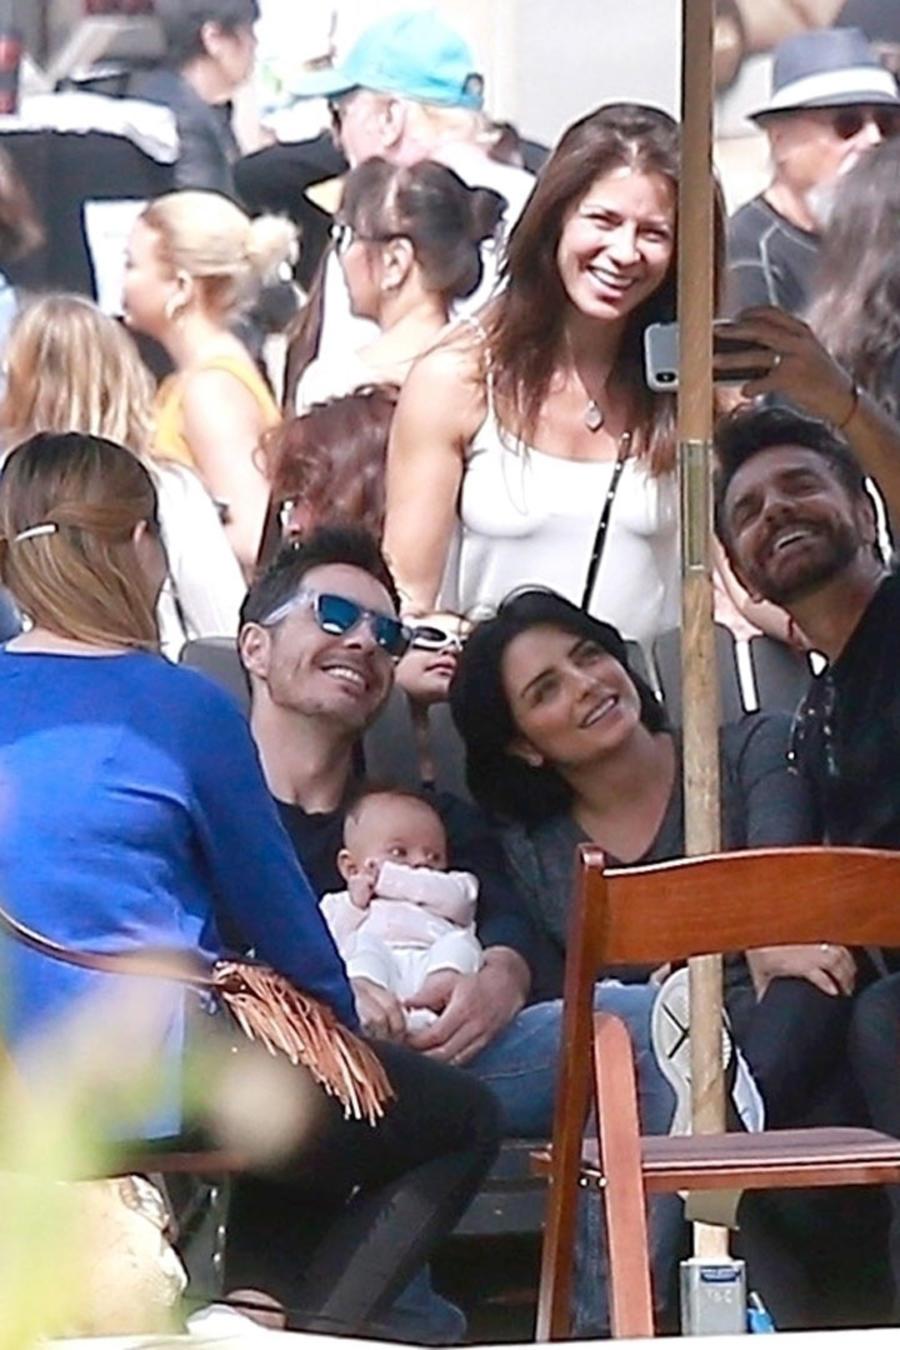 Familia Derbez selfie